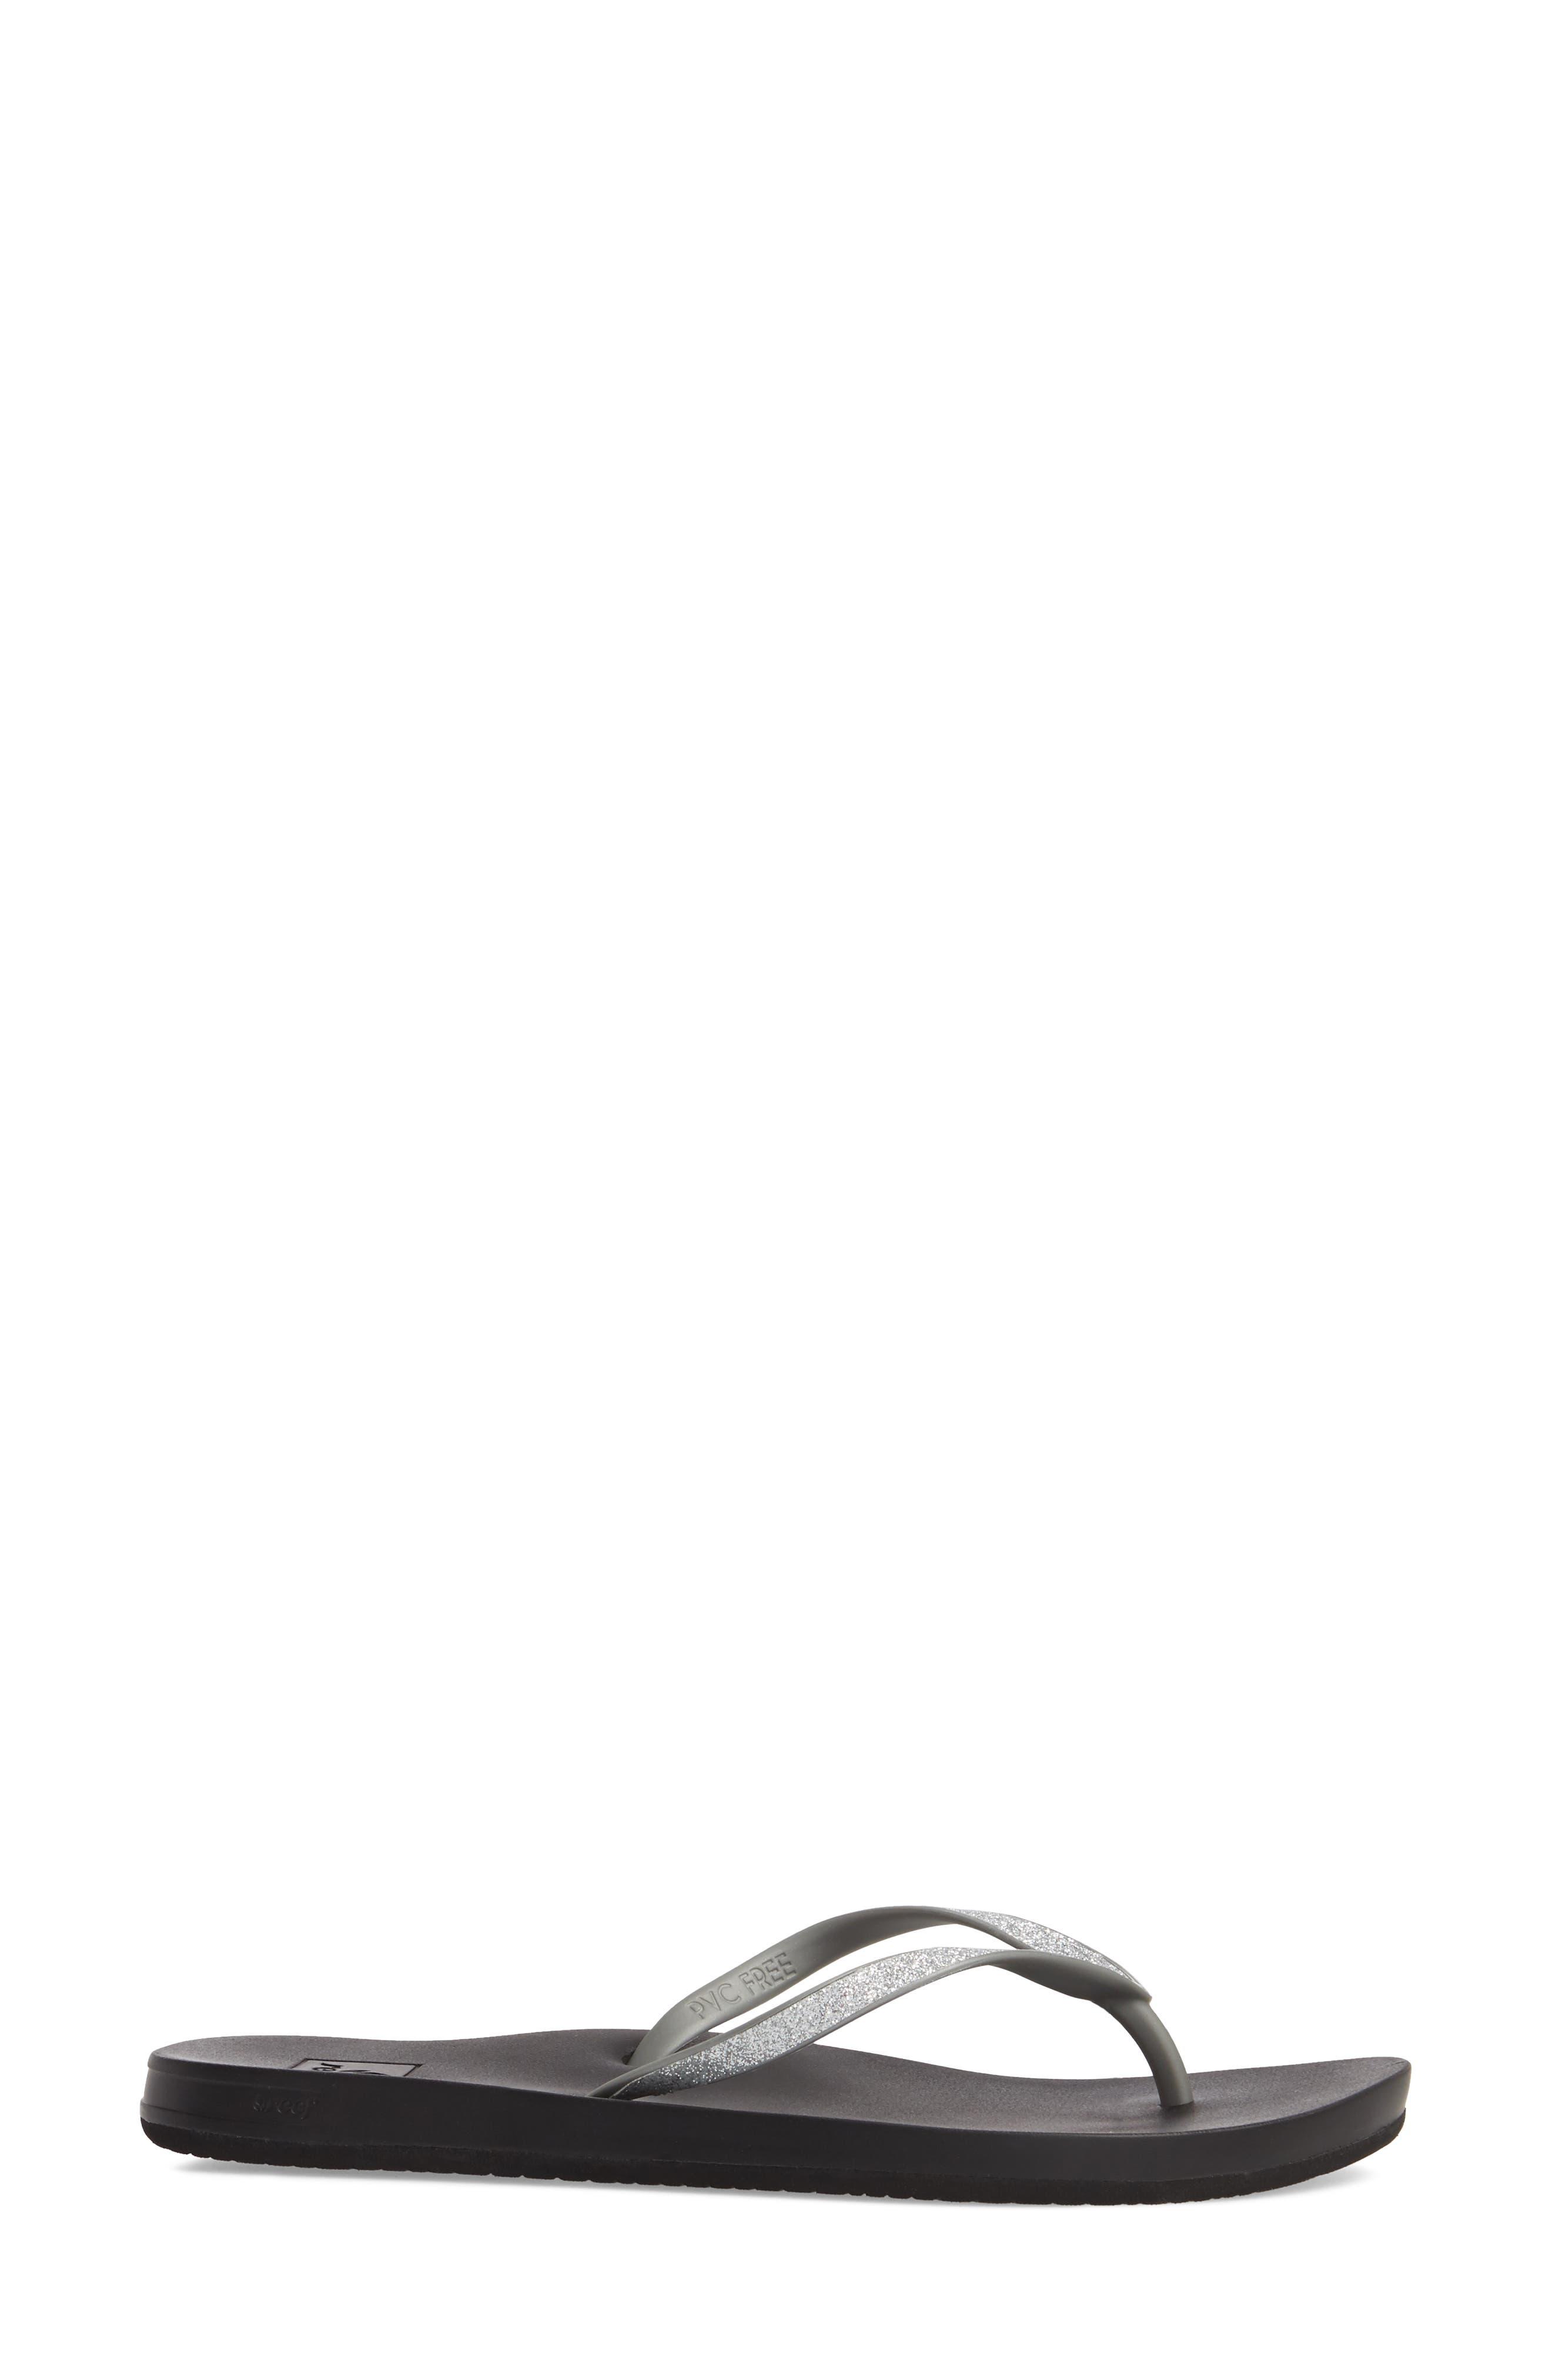 Cushion Bounce Stargazer Flip Flop,                             Alternate thumbnail 3, color,                             Silver